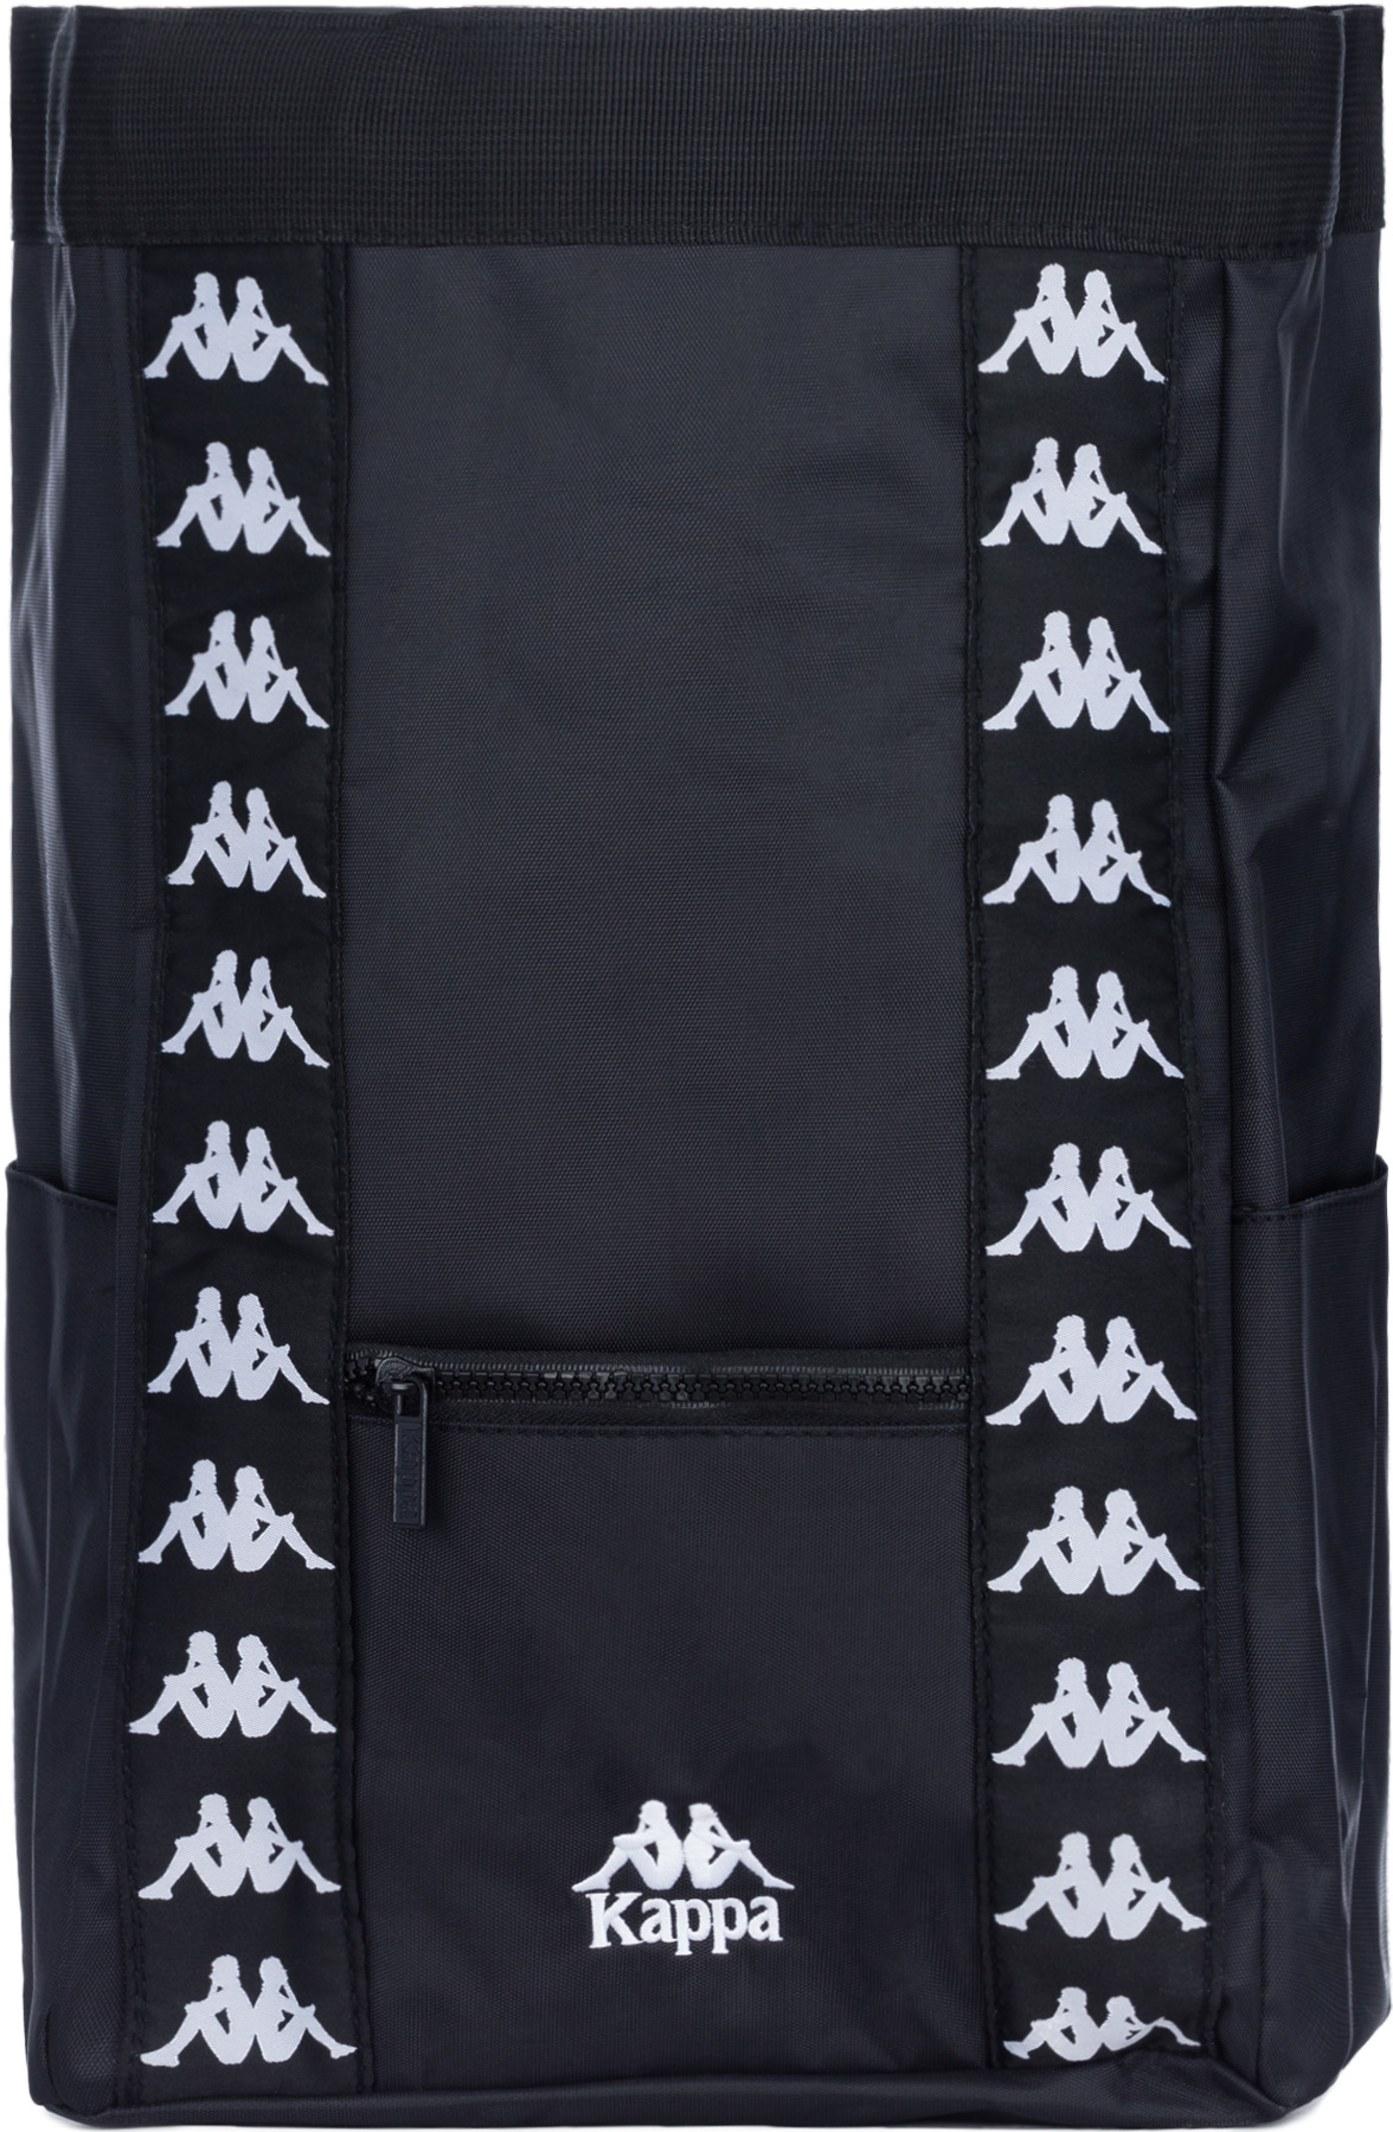 9d37d68232 Kappa  222 Banda Authentic Aninges Backpack - Black White